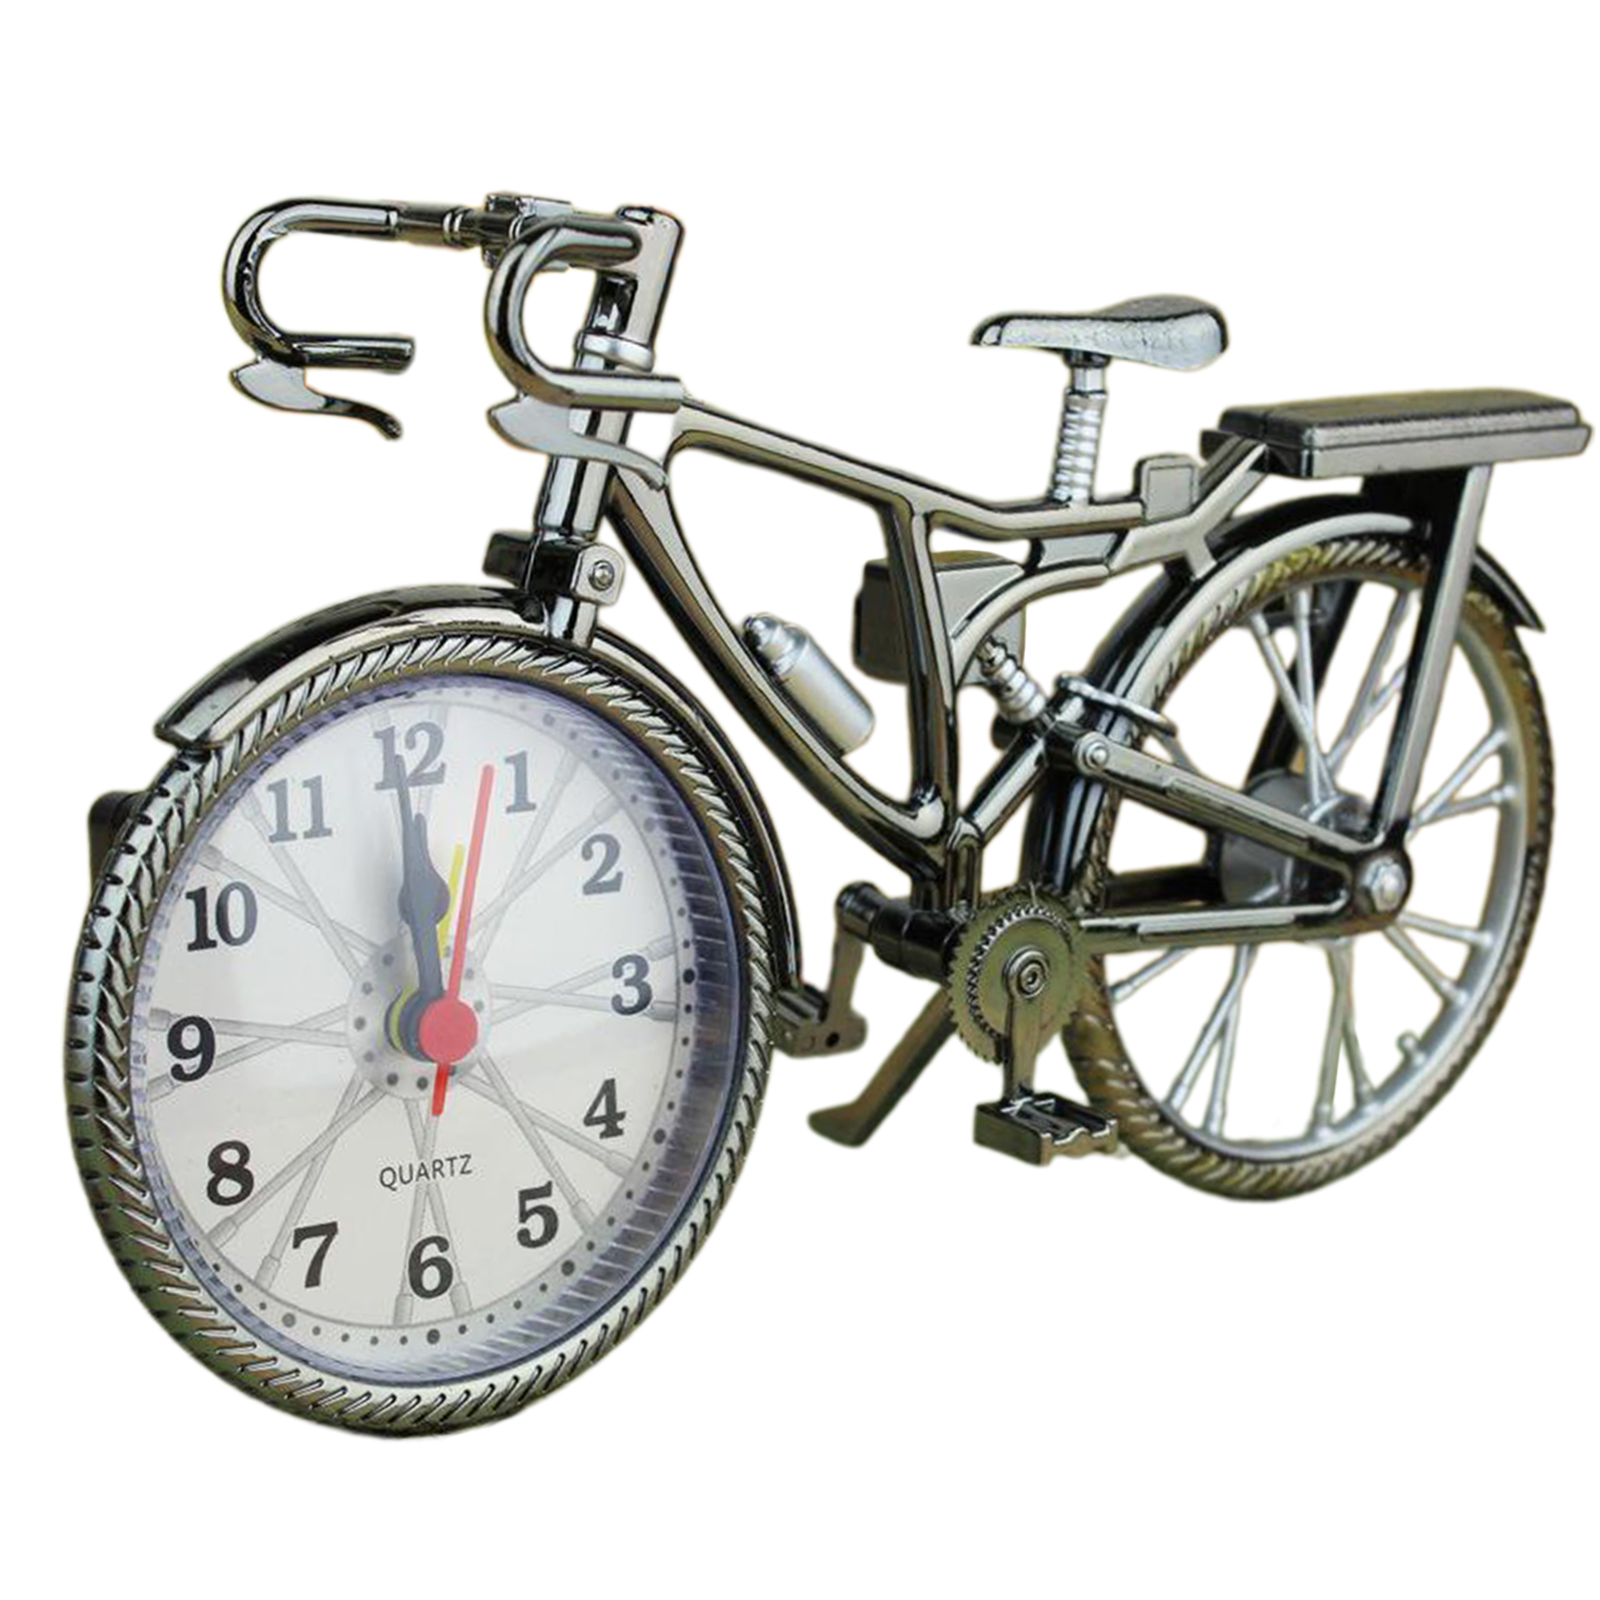 Vintage Arabic Numeral Retro Bicycle Pattern Creative Alarm Clock Home Decor